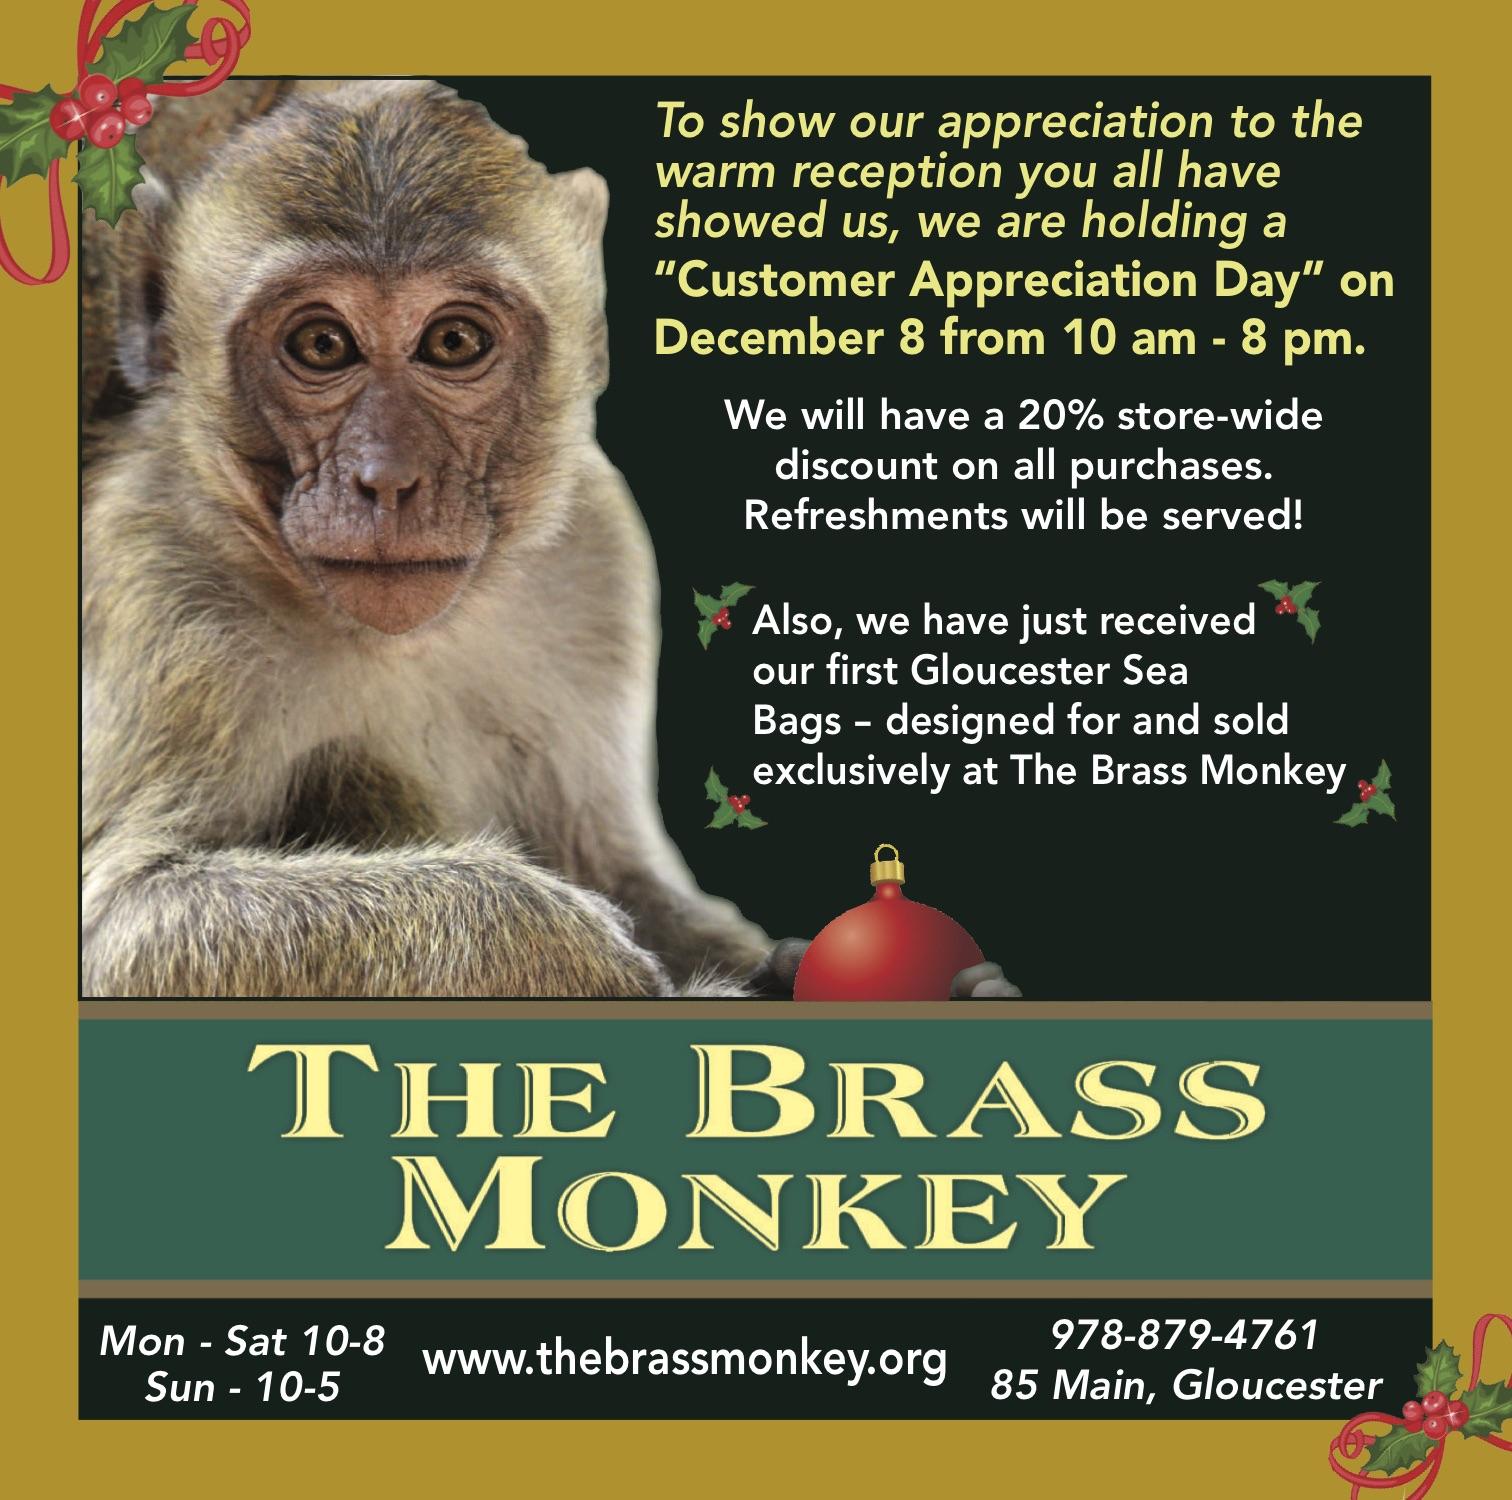 The Brass Monkey_Customer Appreciation copy.jpg